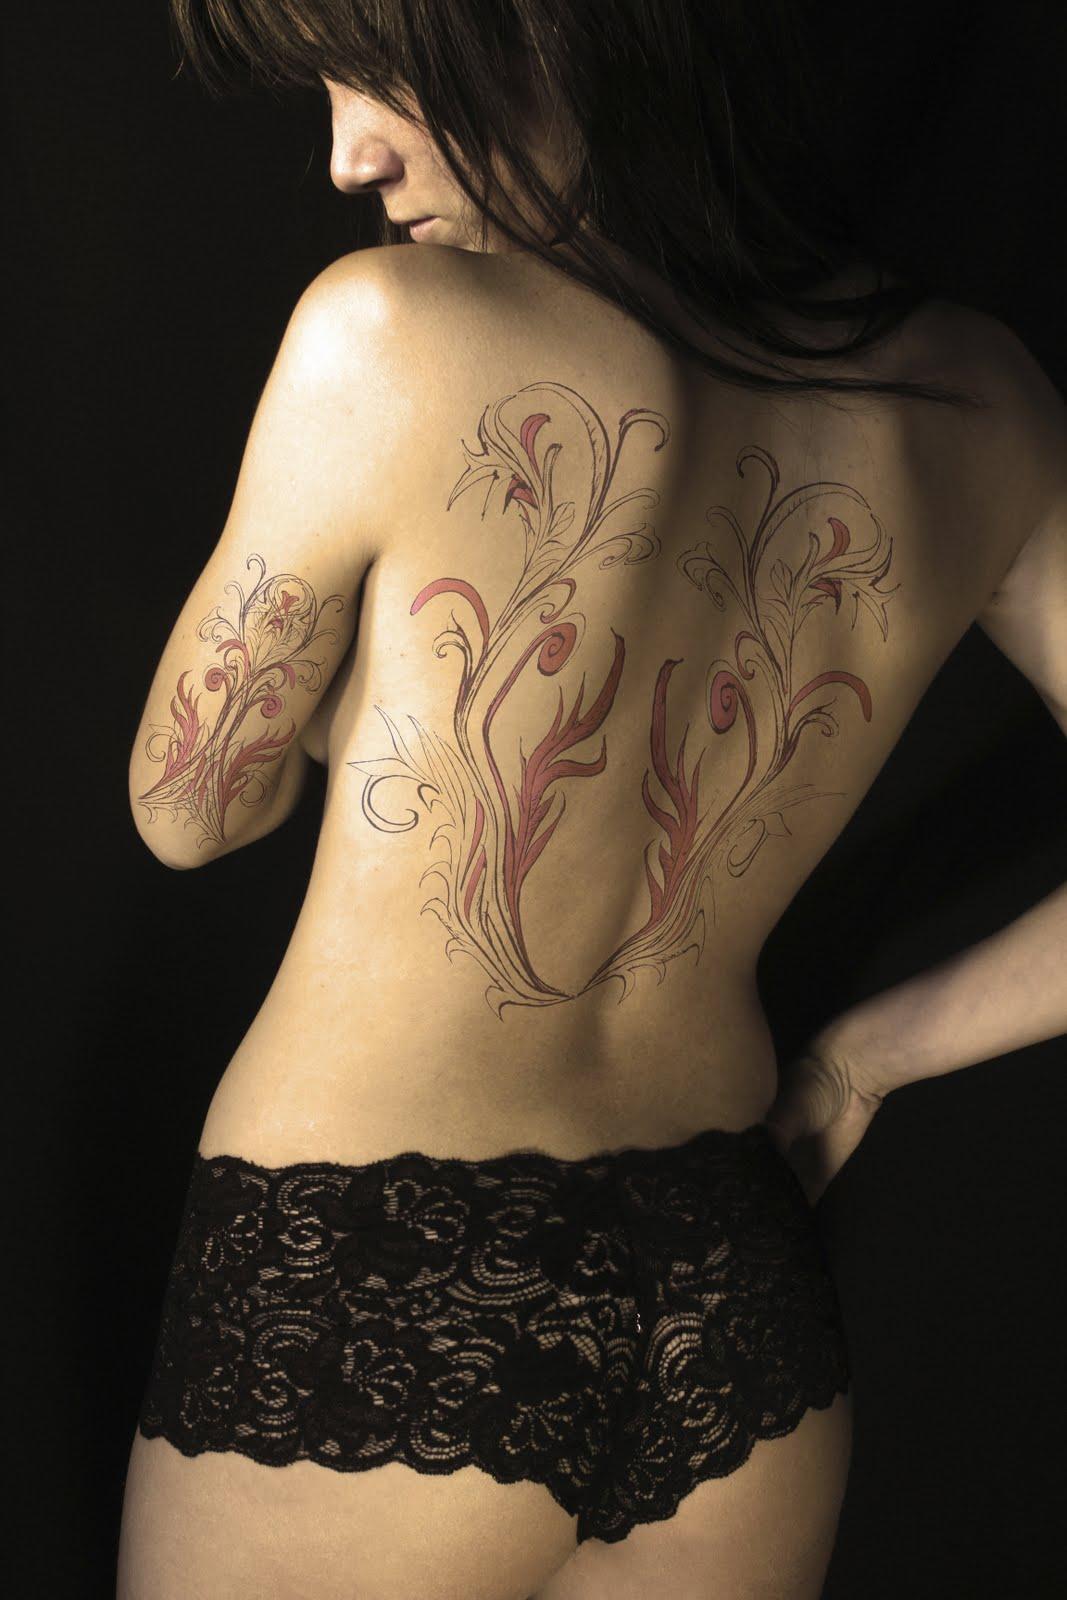 full back tattoo design ideas